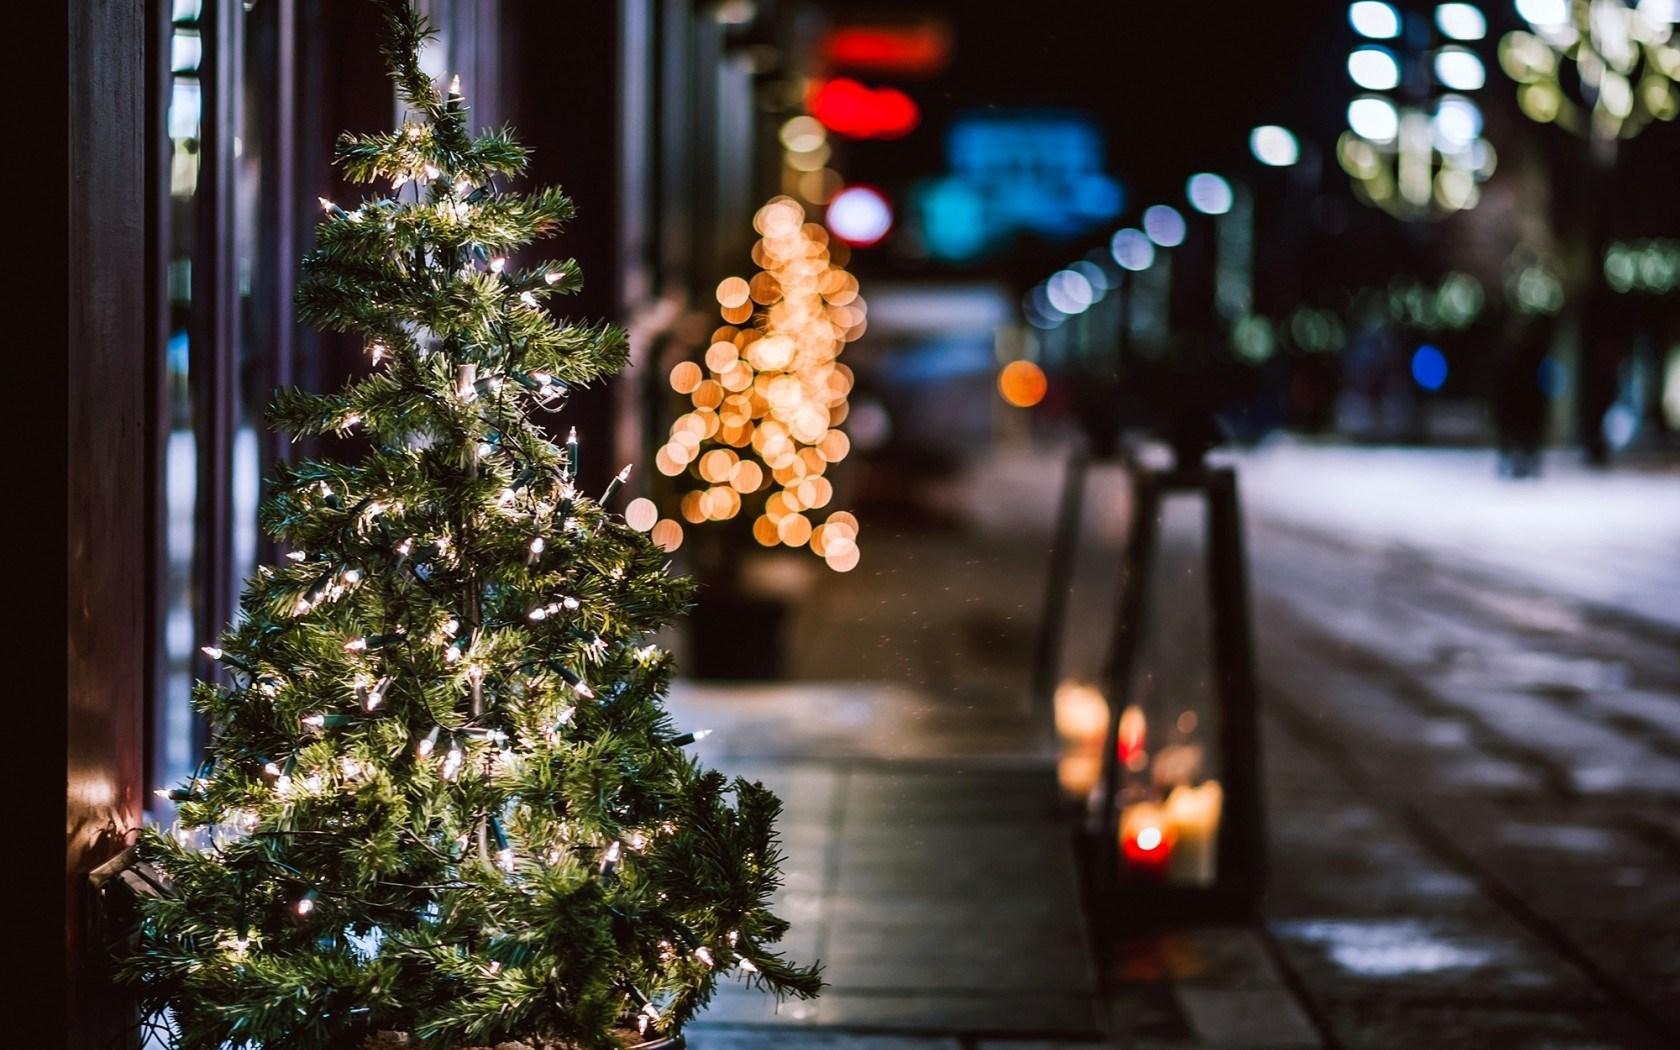 7039258-christmas-tree-garland-lights-city-street-night-winter.jpg